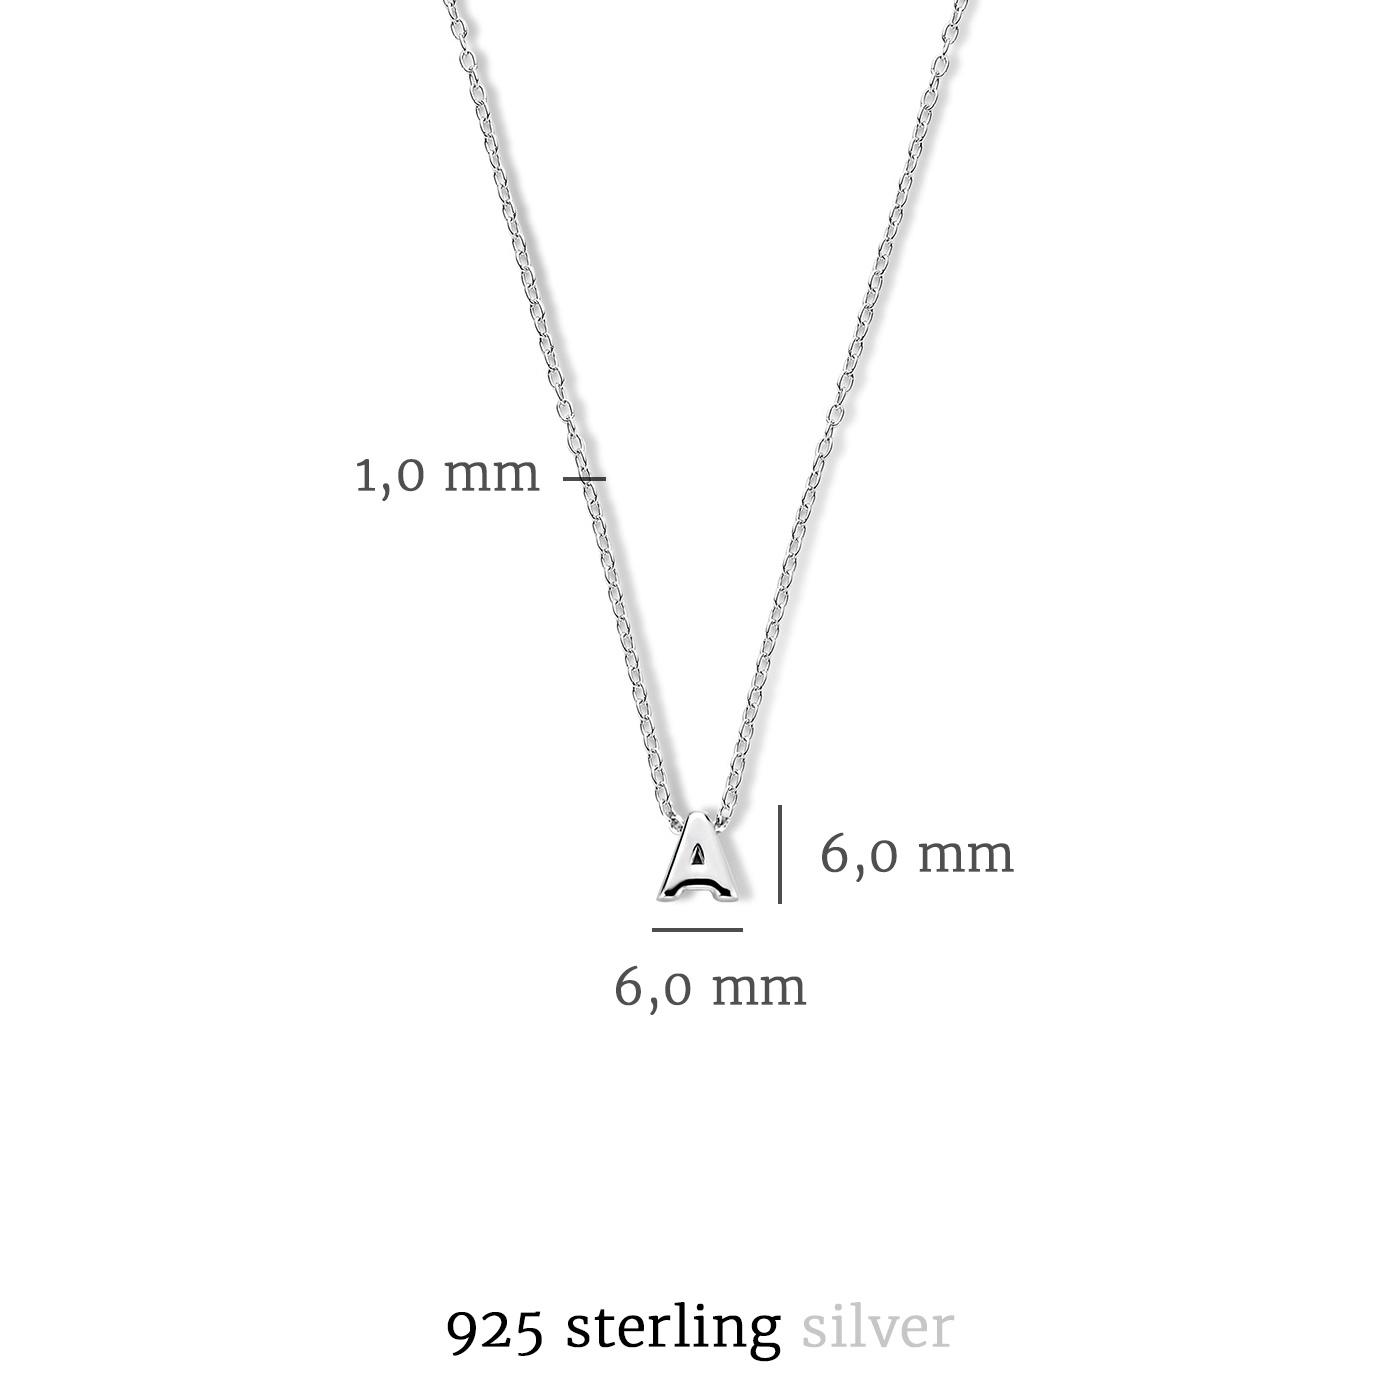 Selected Jewels Julie Chloé collier initiale en argent sterling 925